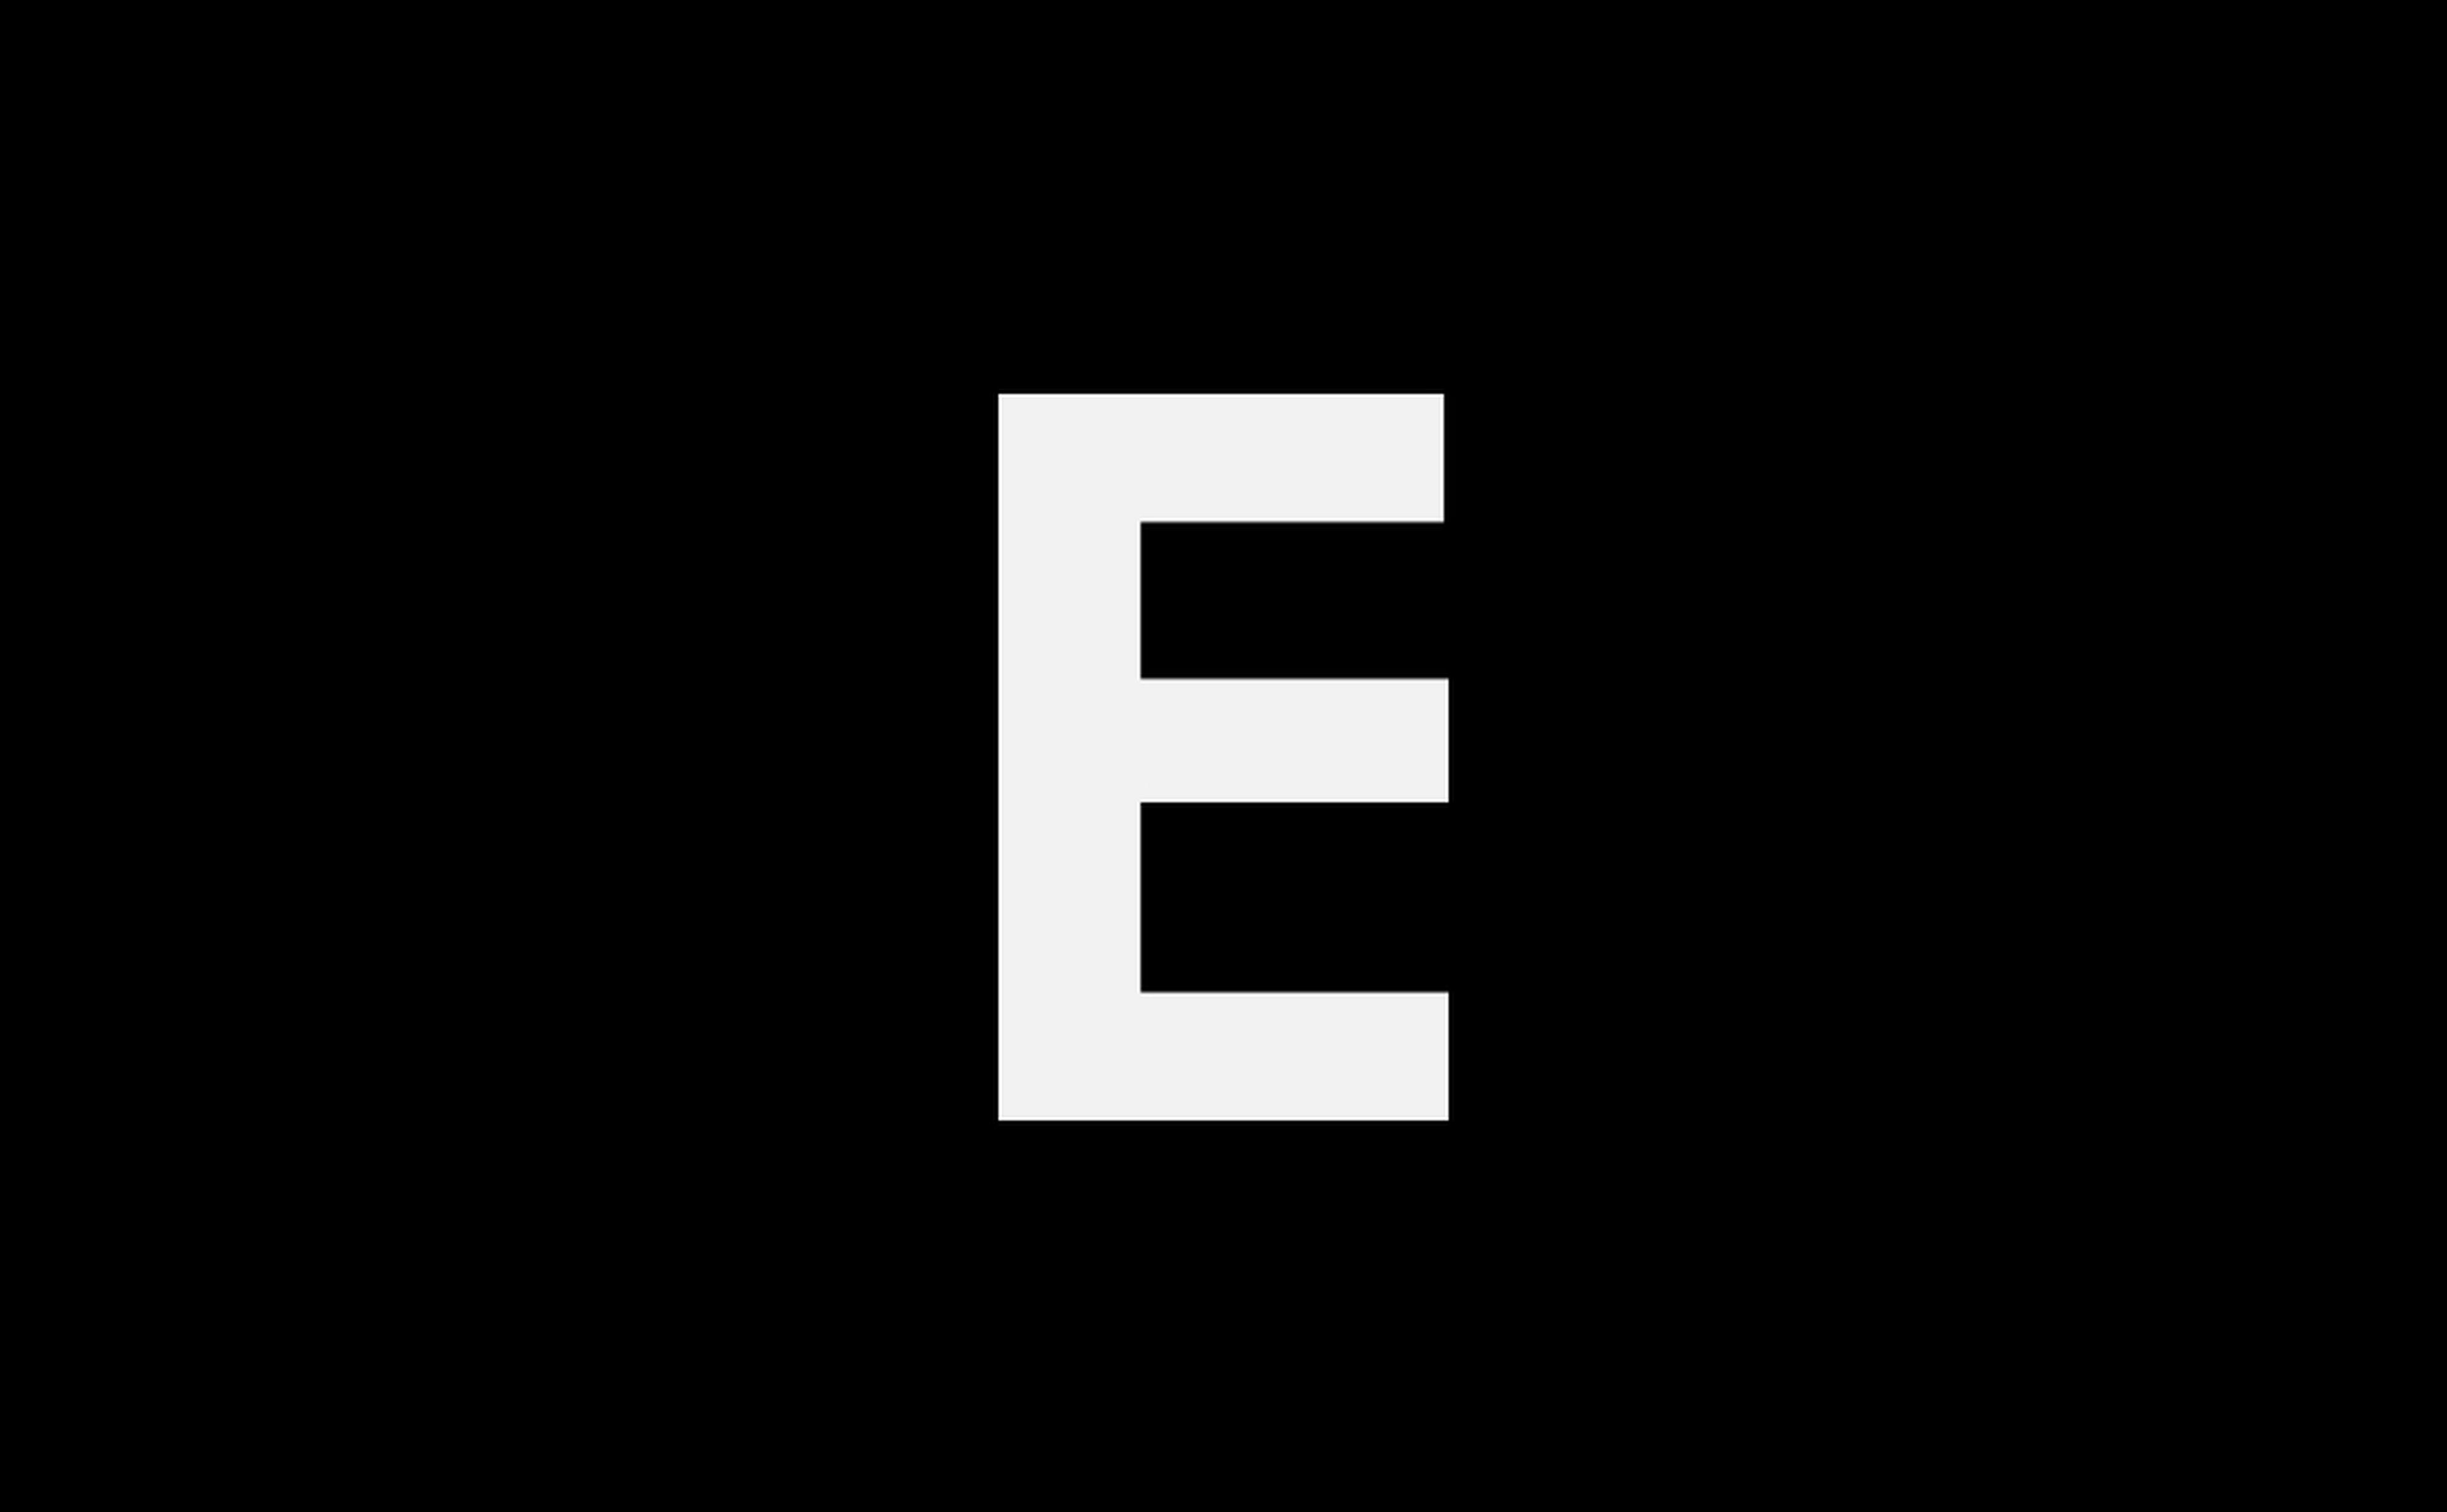 ferris wheel, arts culture and entertainment, amusement park, sunset, sky, amusement park ride, no people, big wheel, night, built structure, outdoors, low angle view, blue, illuminated, building exterior, architecture, nature